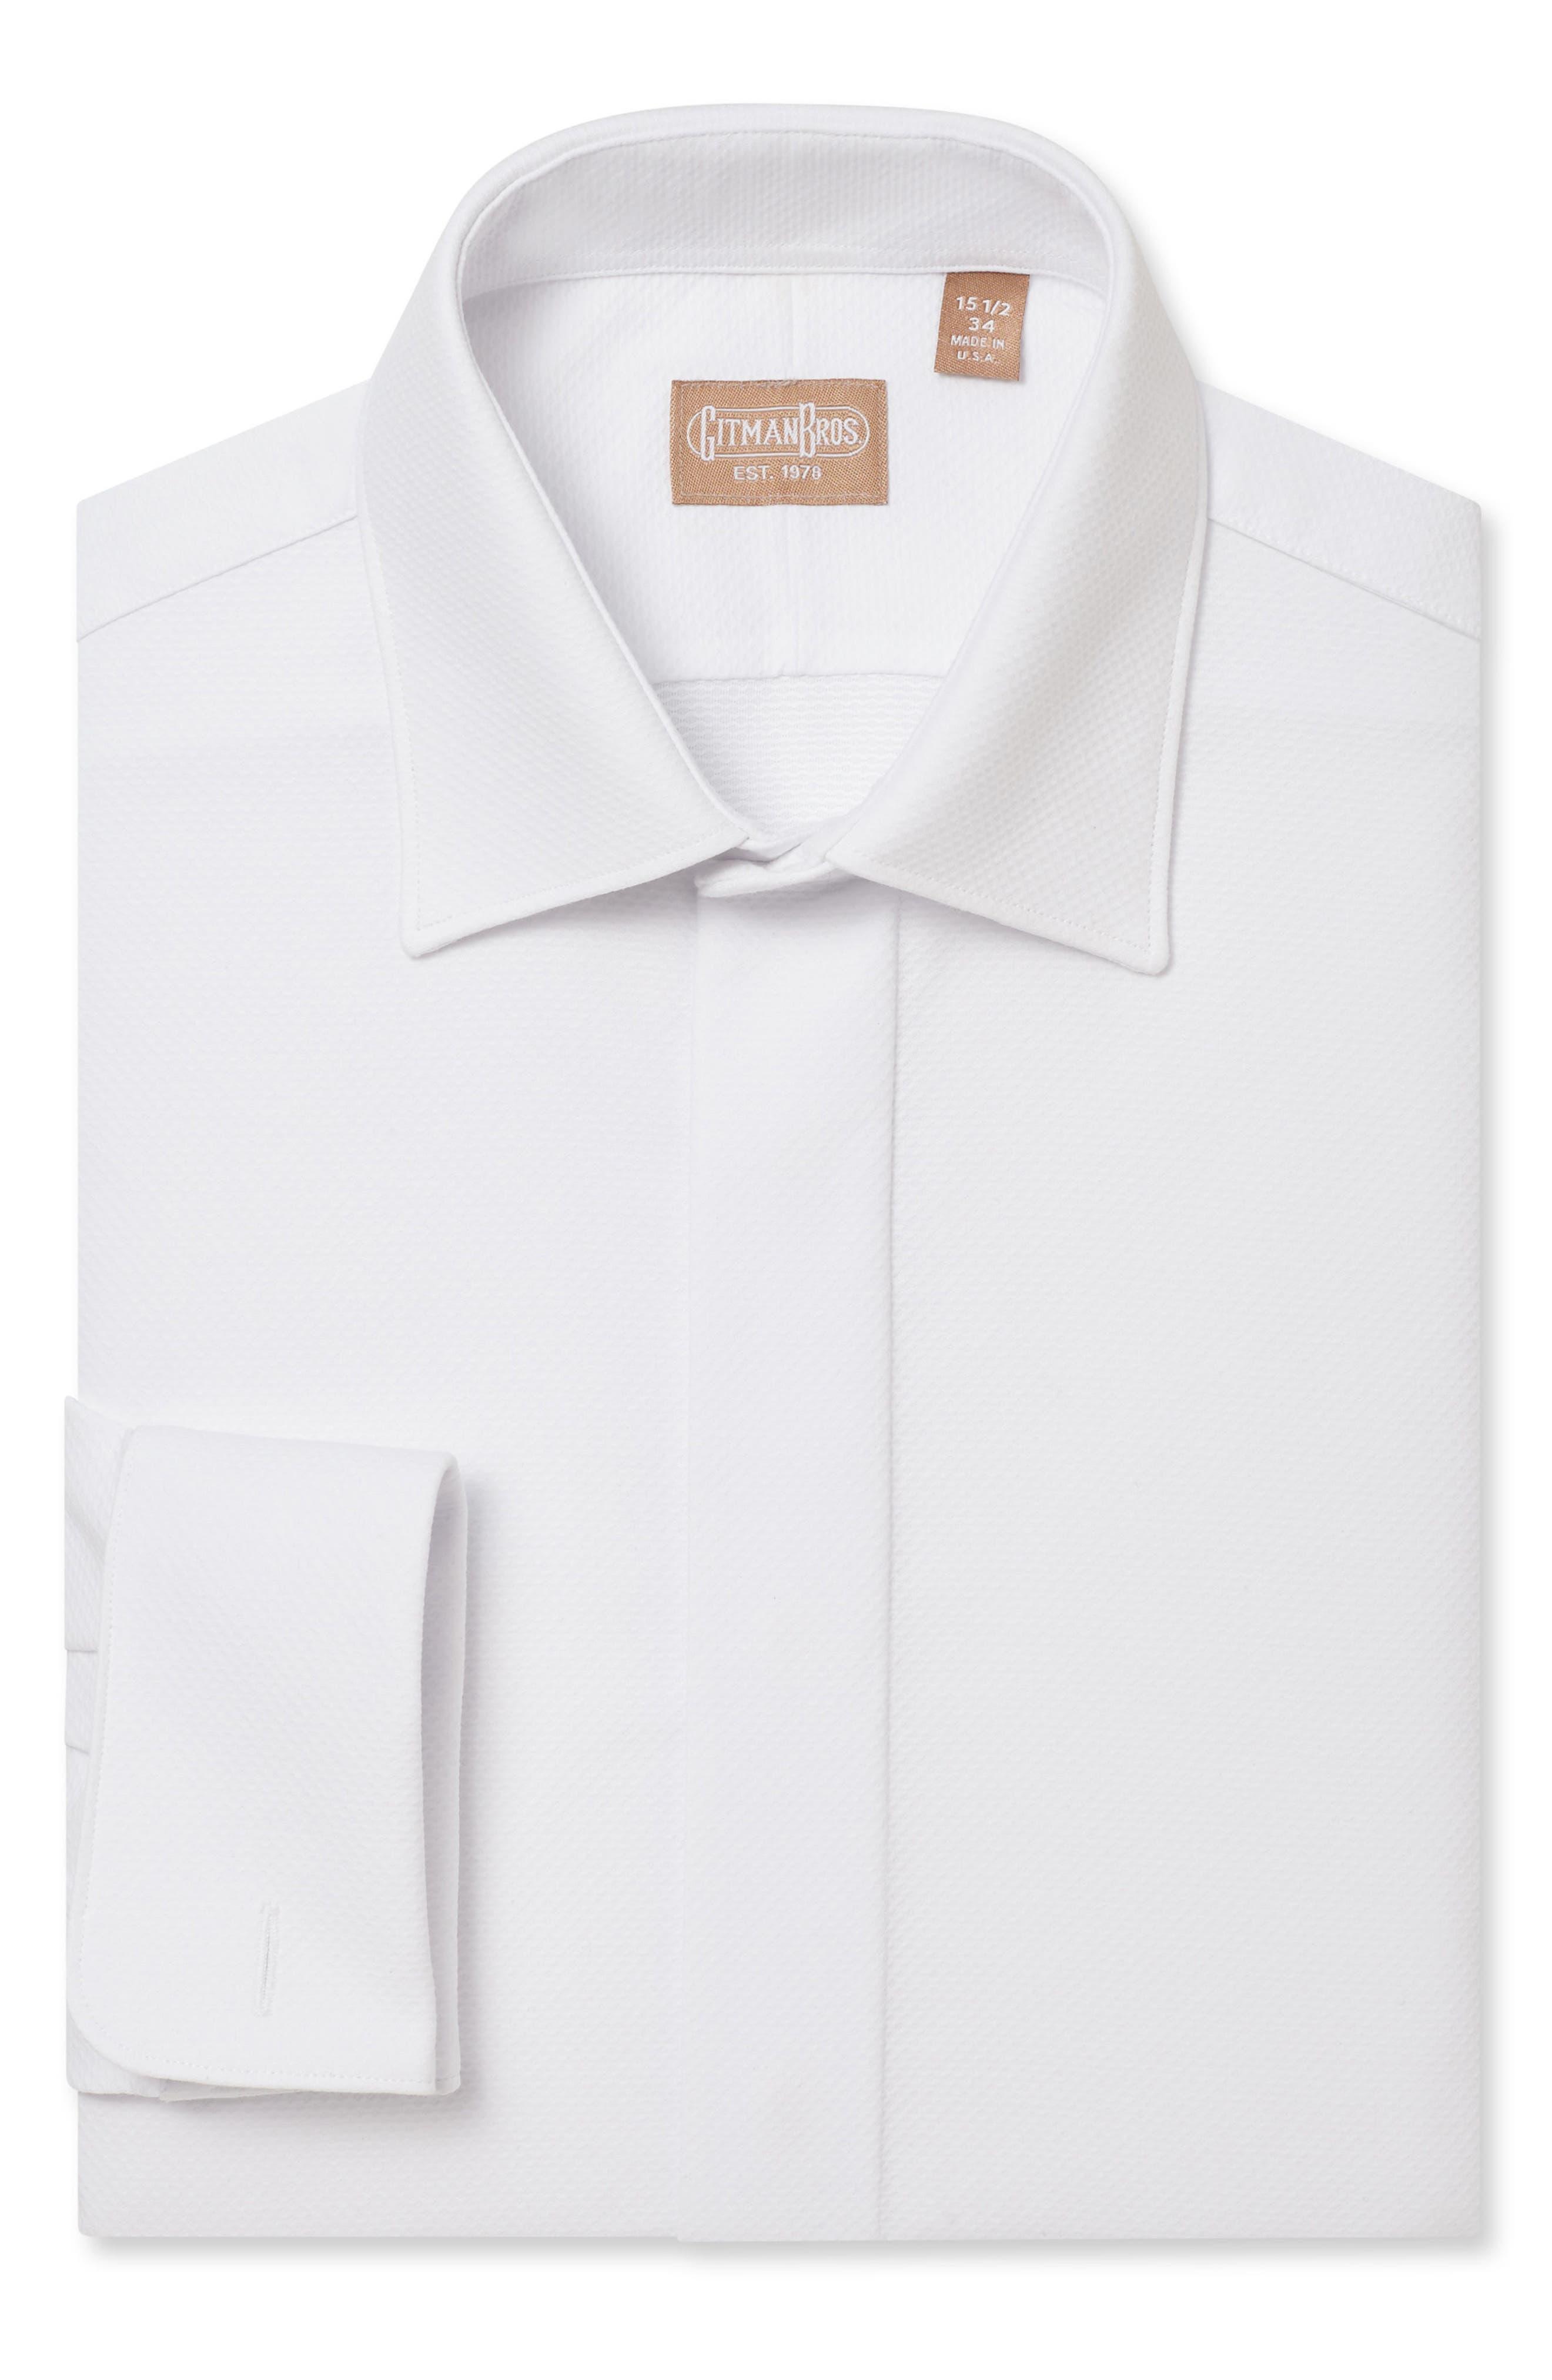 GITMAN, Regular Fit Tuxedo Shirt, Main thumbnail 1, color, WHITE